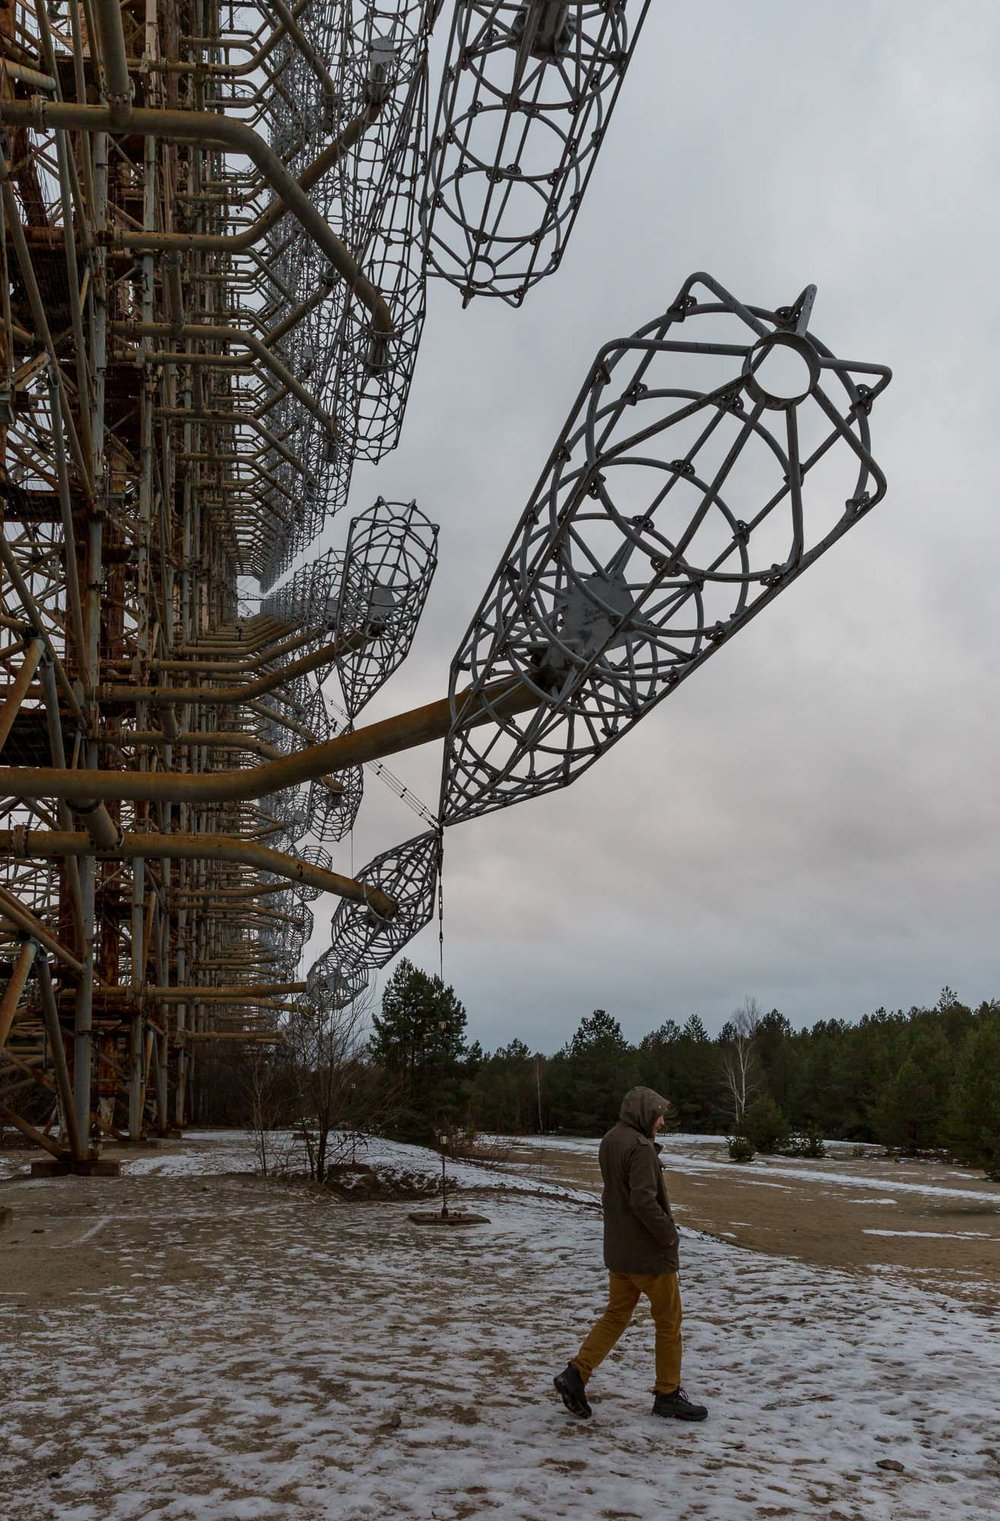 2017_01_02_ben_kepka_cultured_kiwi_Ukraine_Chernobyl-42.jpg